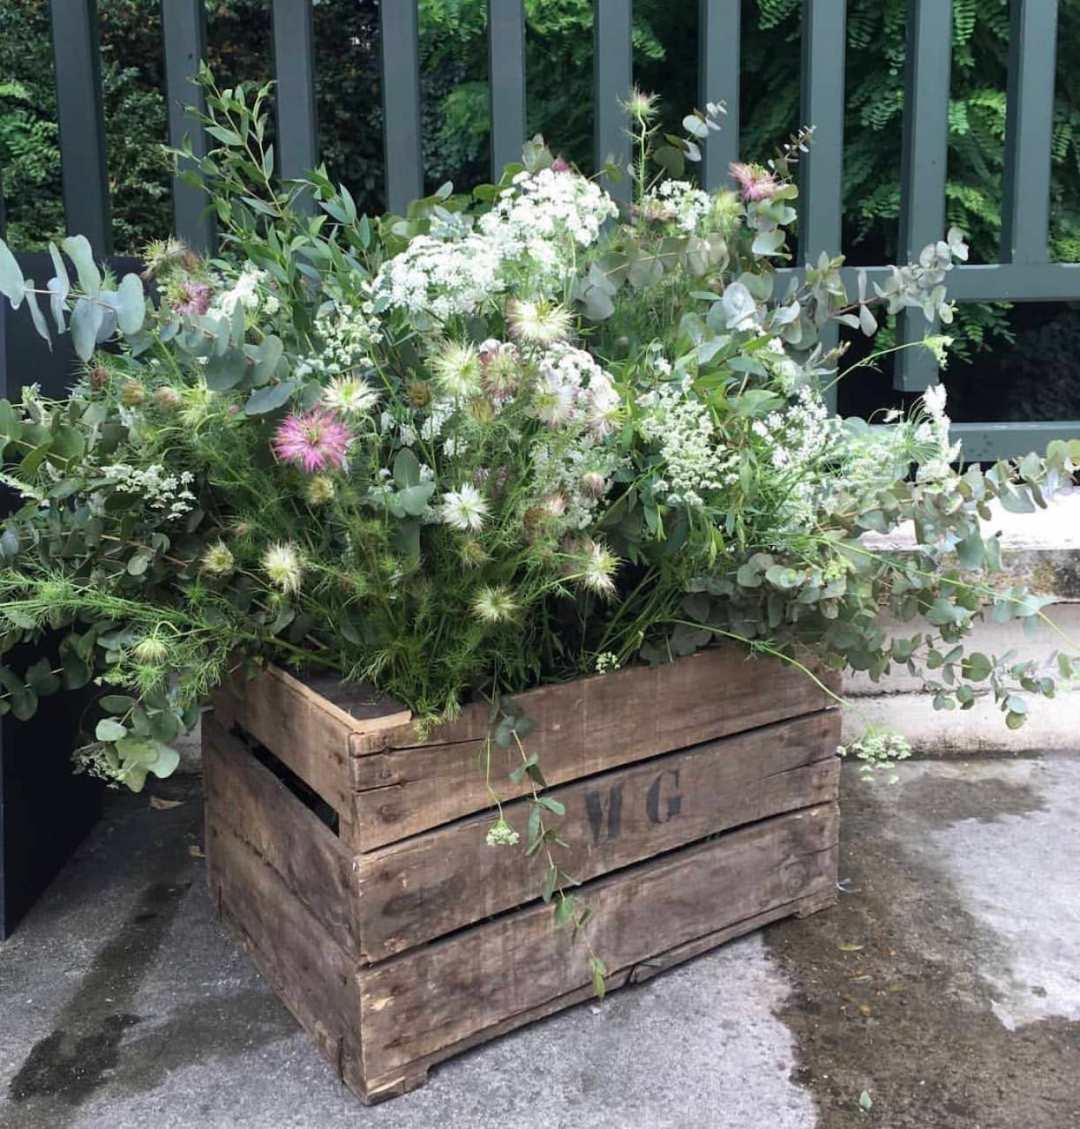 lieu-reception-caisse-fleurie-champetre-mariage